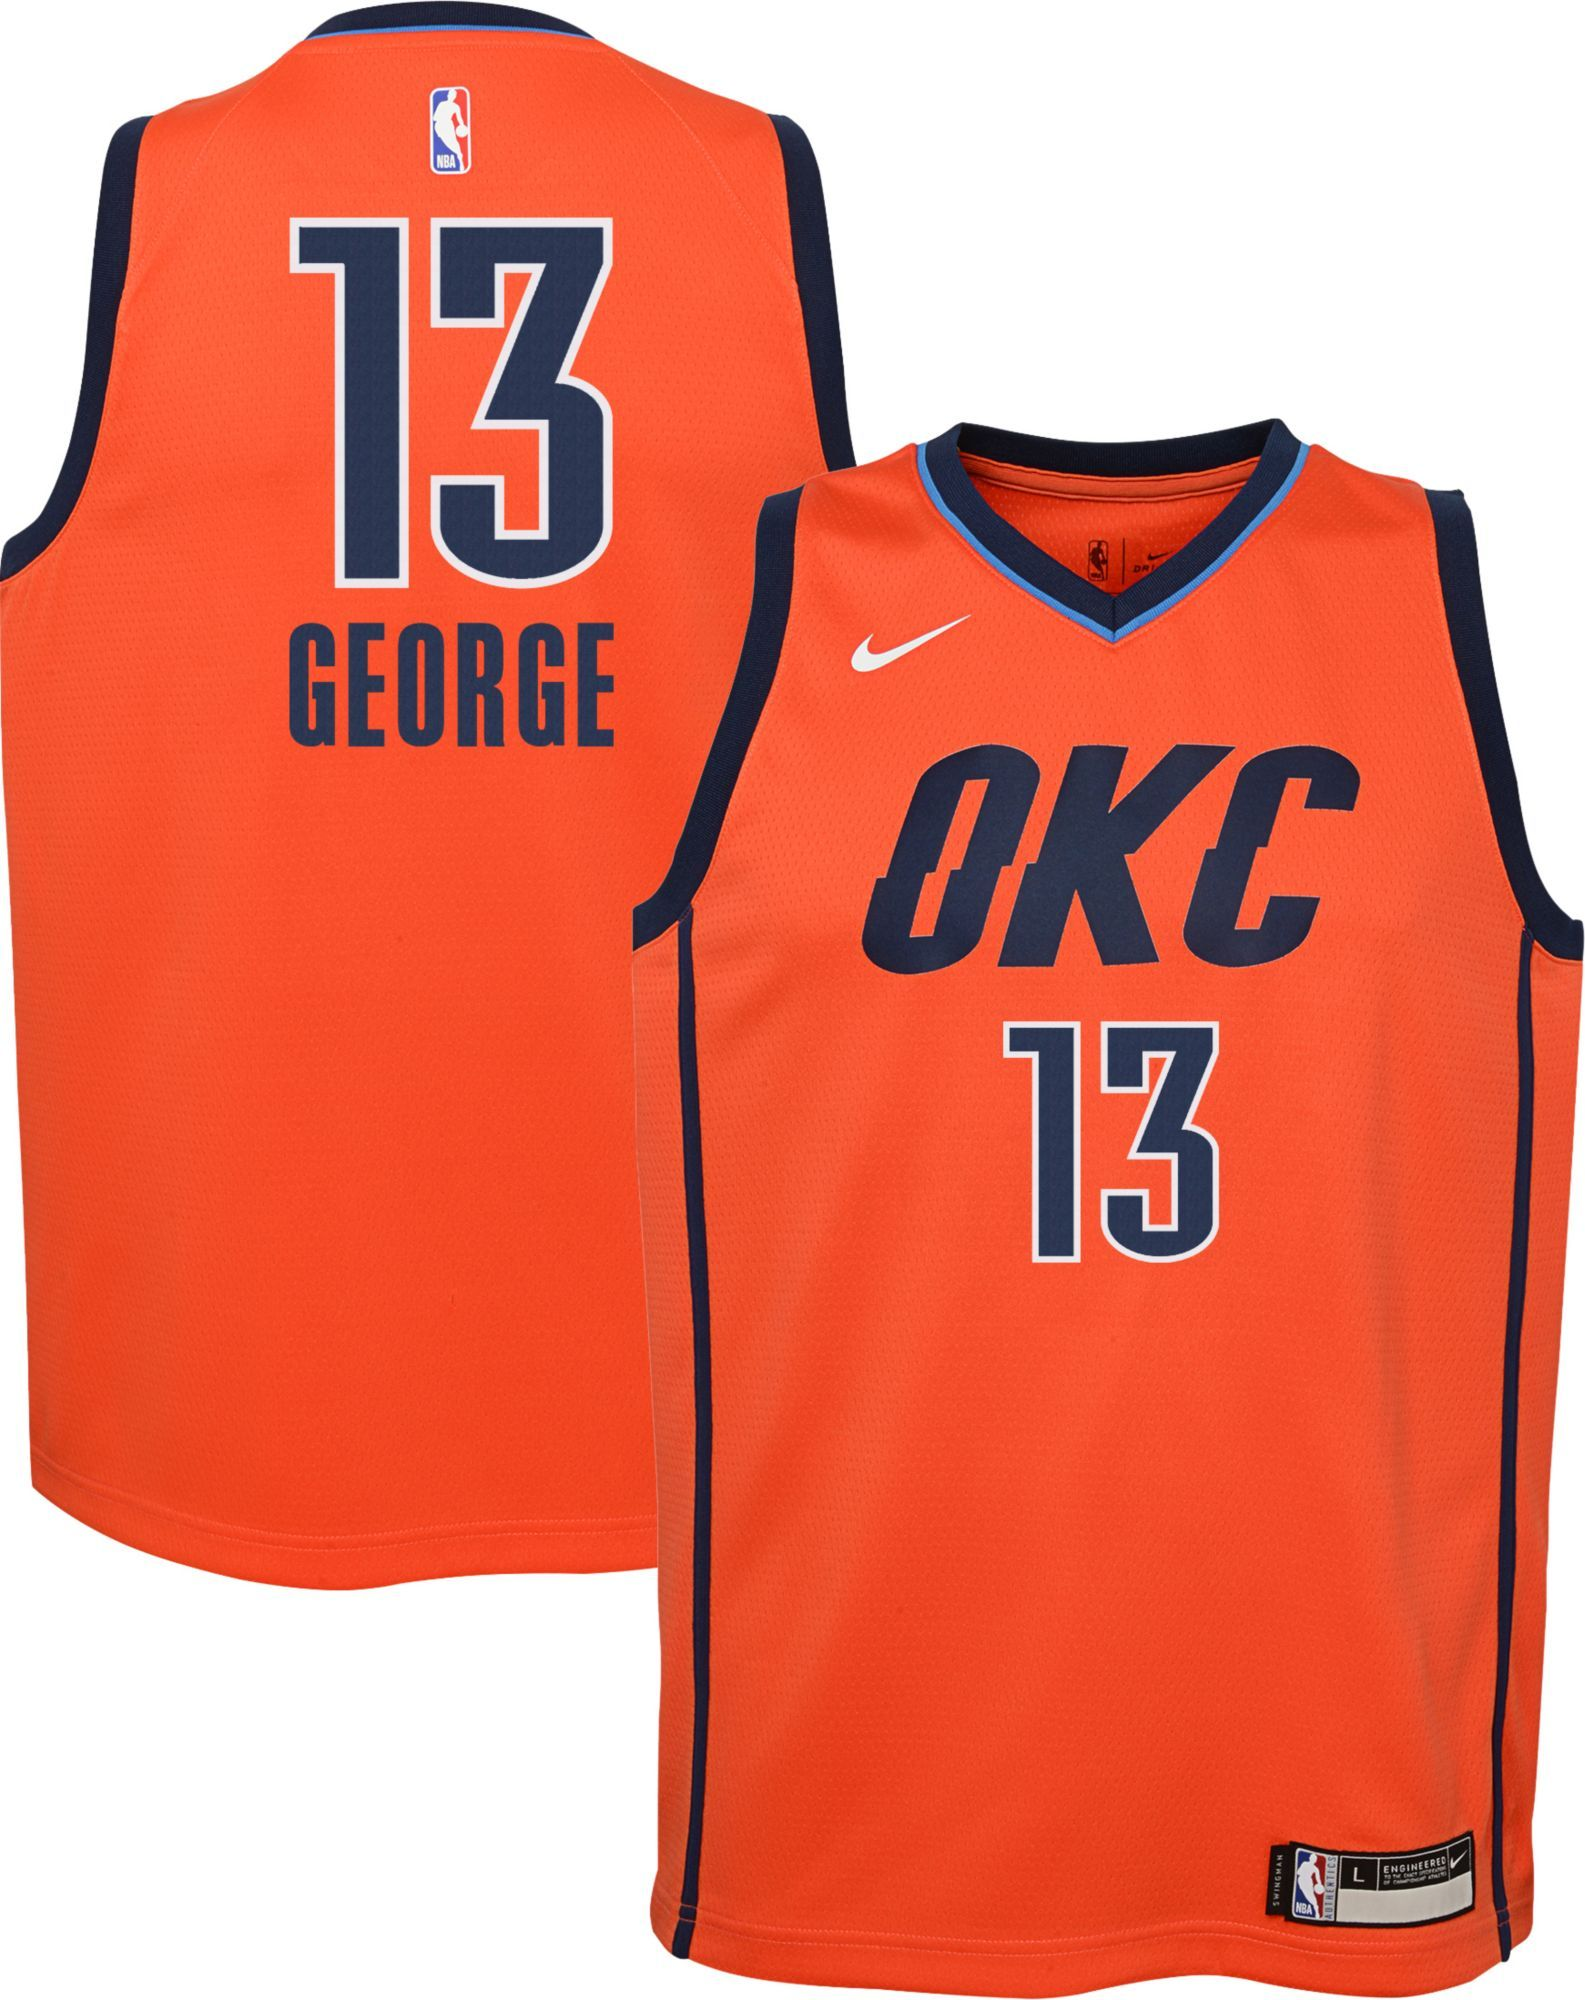 huge selection of fd046 4b496 Nike Youth Oklahoma City Thunder Paul George Dri-FIT Earned Edition  Swingman Jersey, Size  XL, Orange